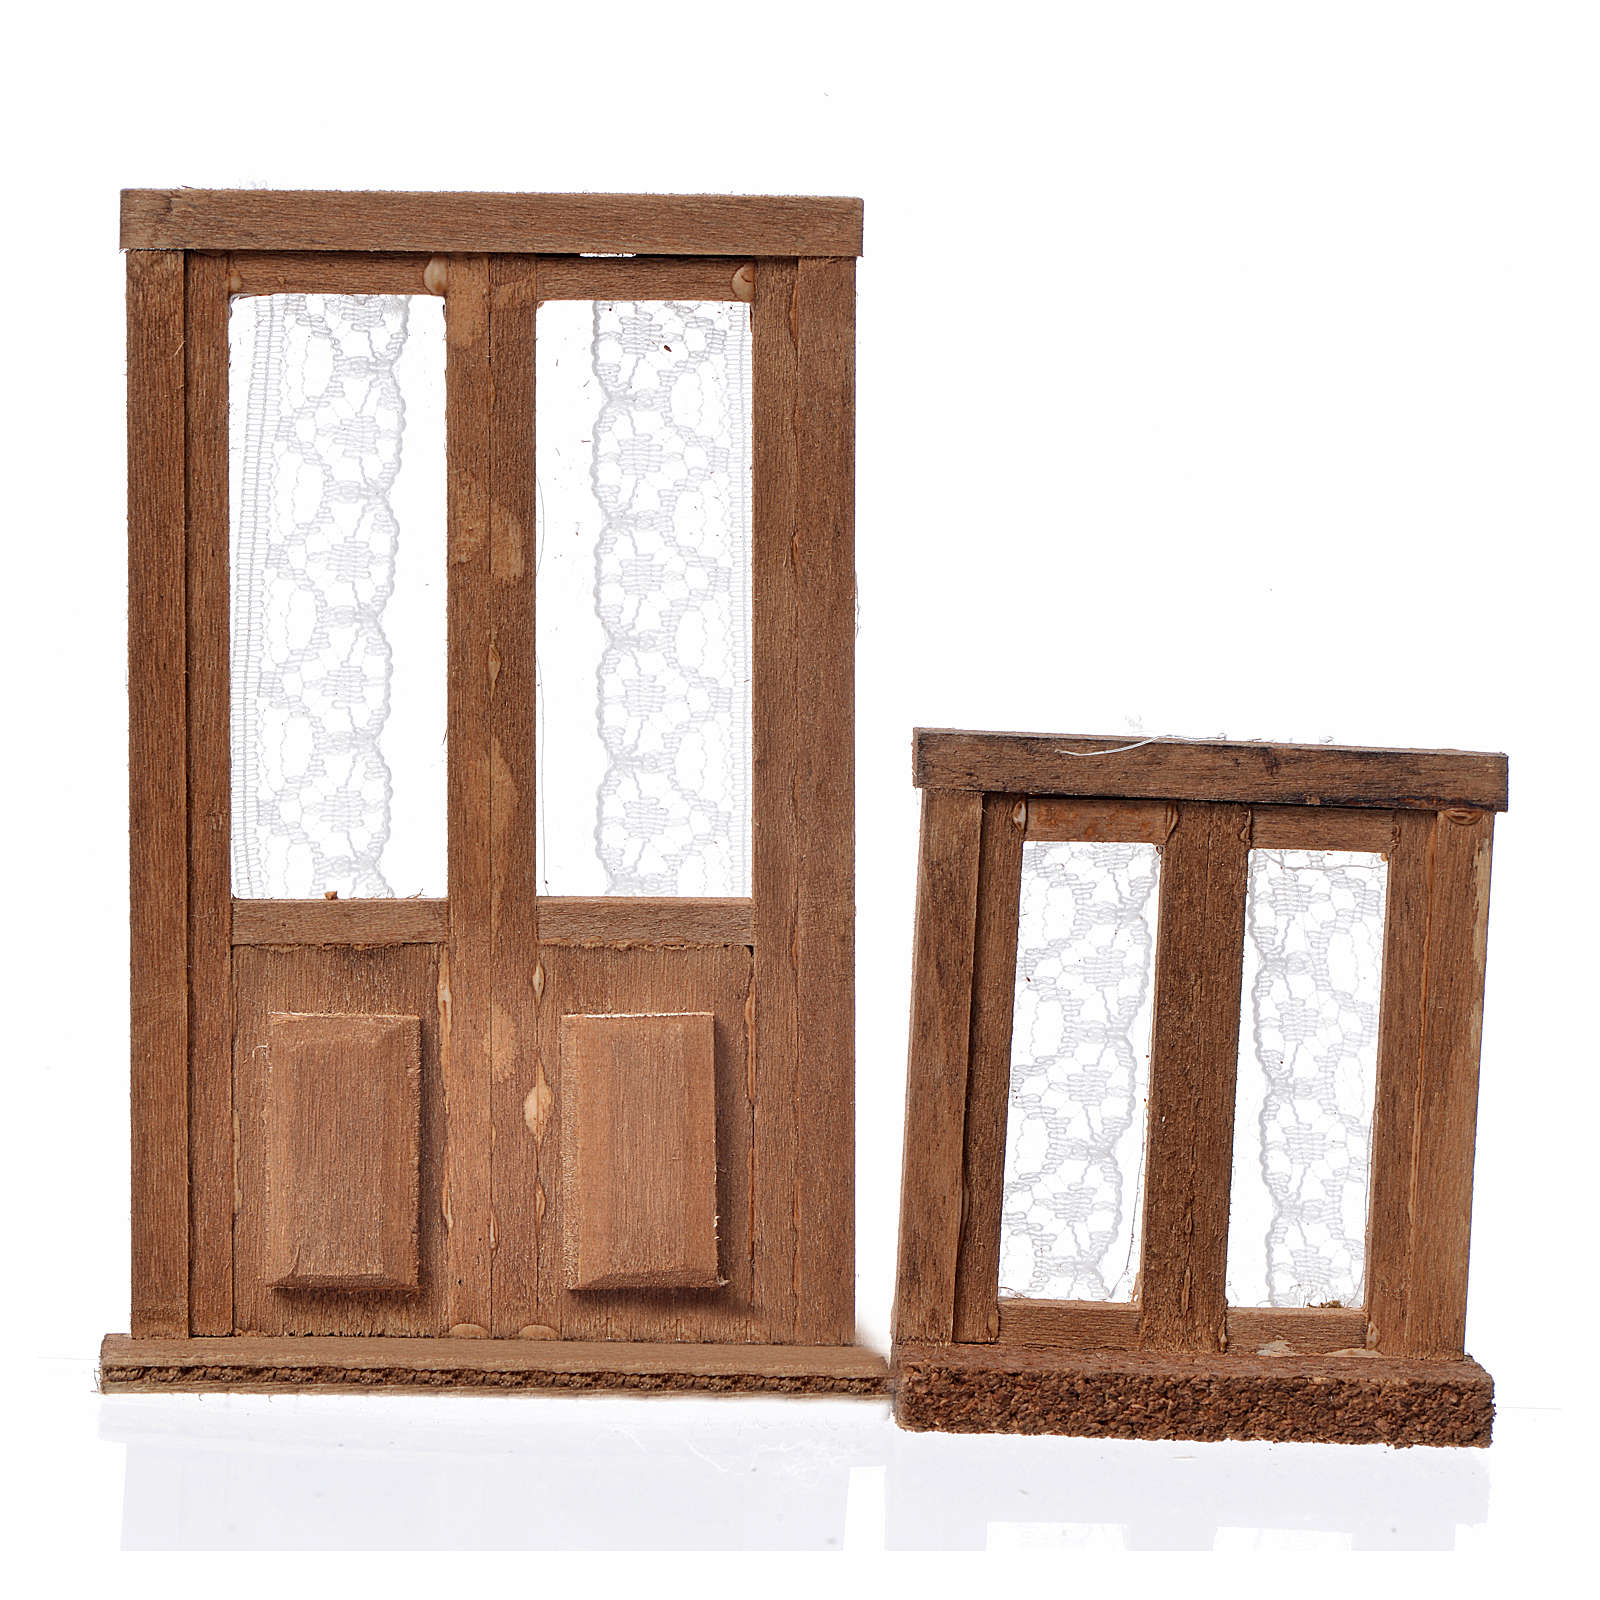 Infissi legno presepe 2 pz 9x6 e 5x4,5 4